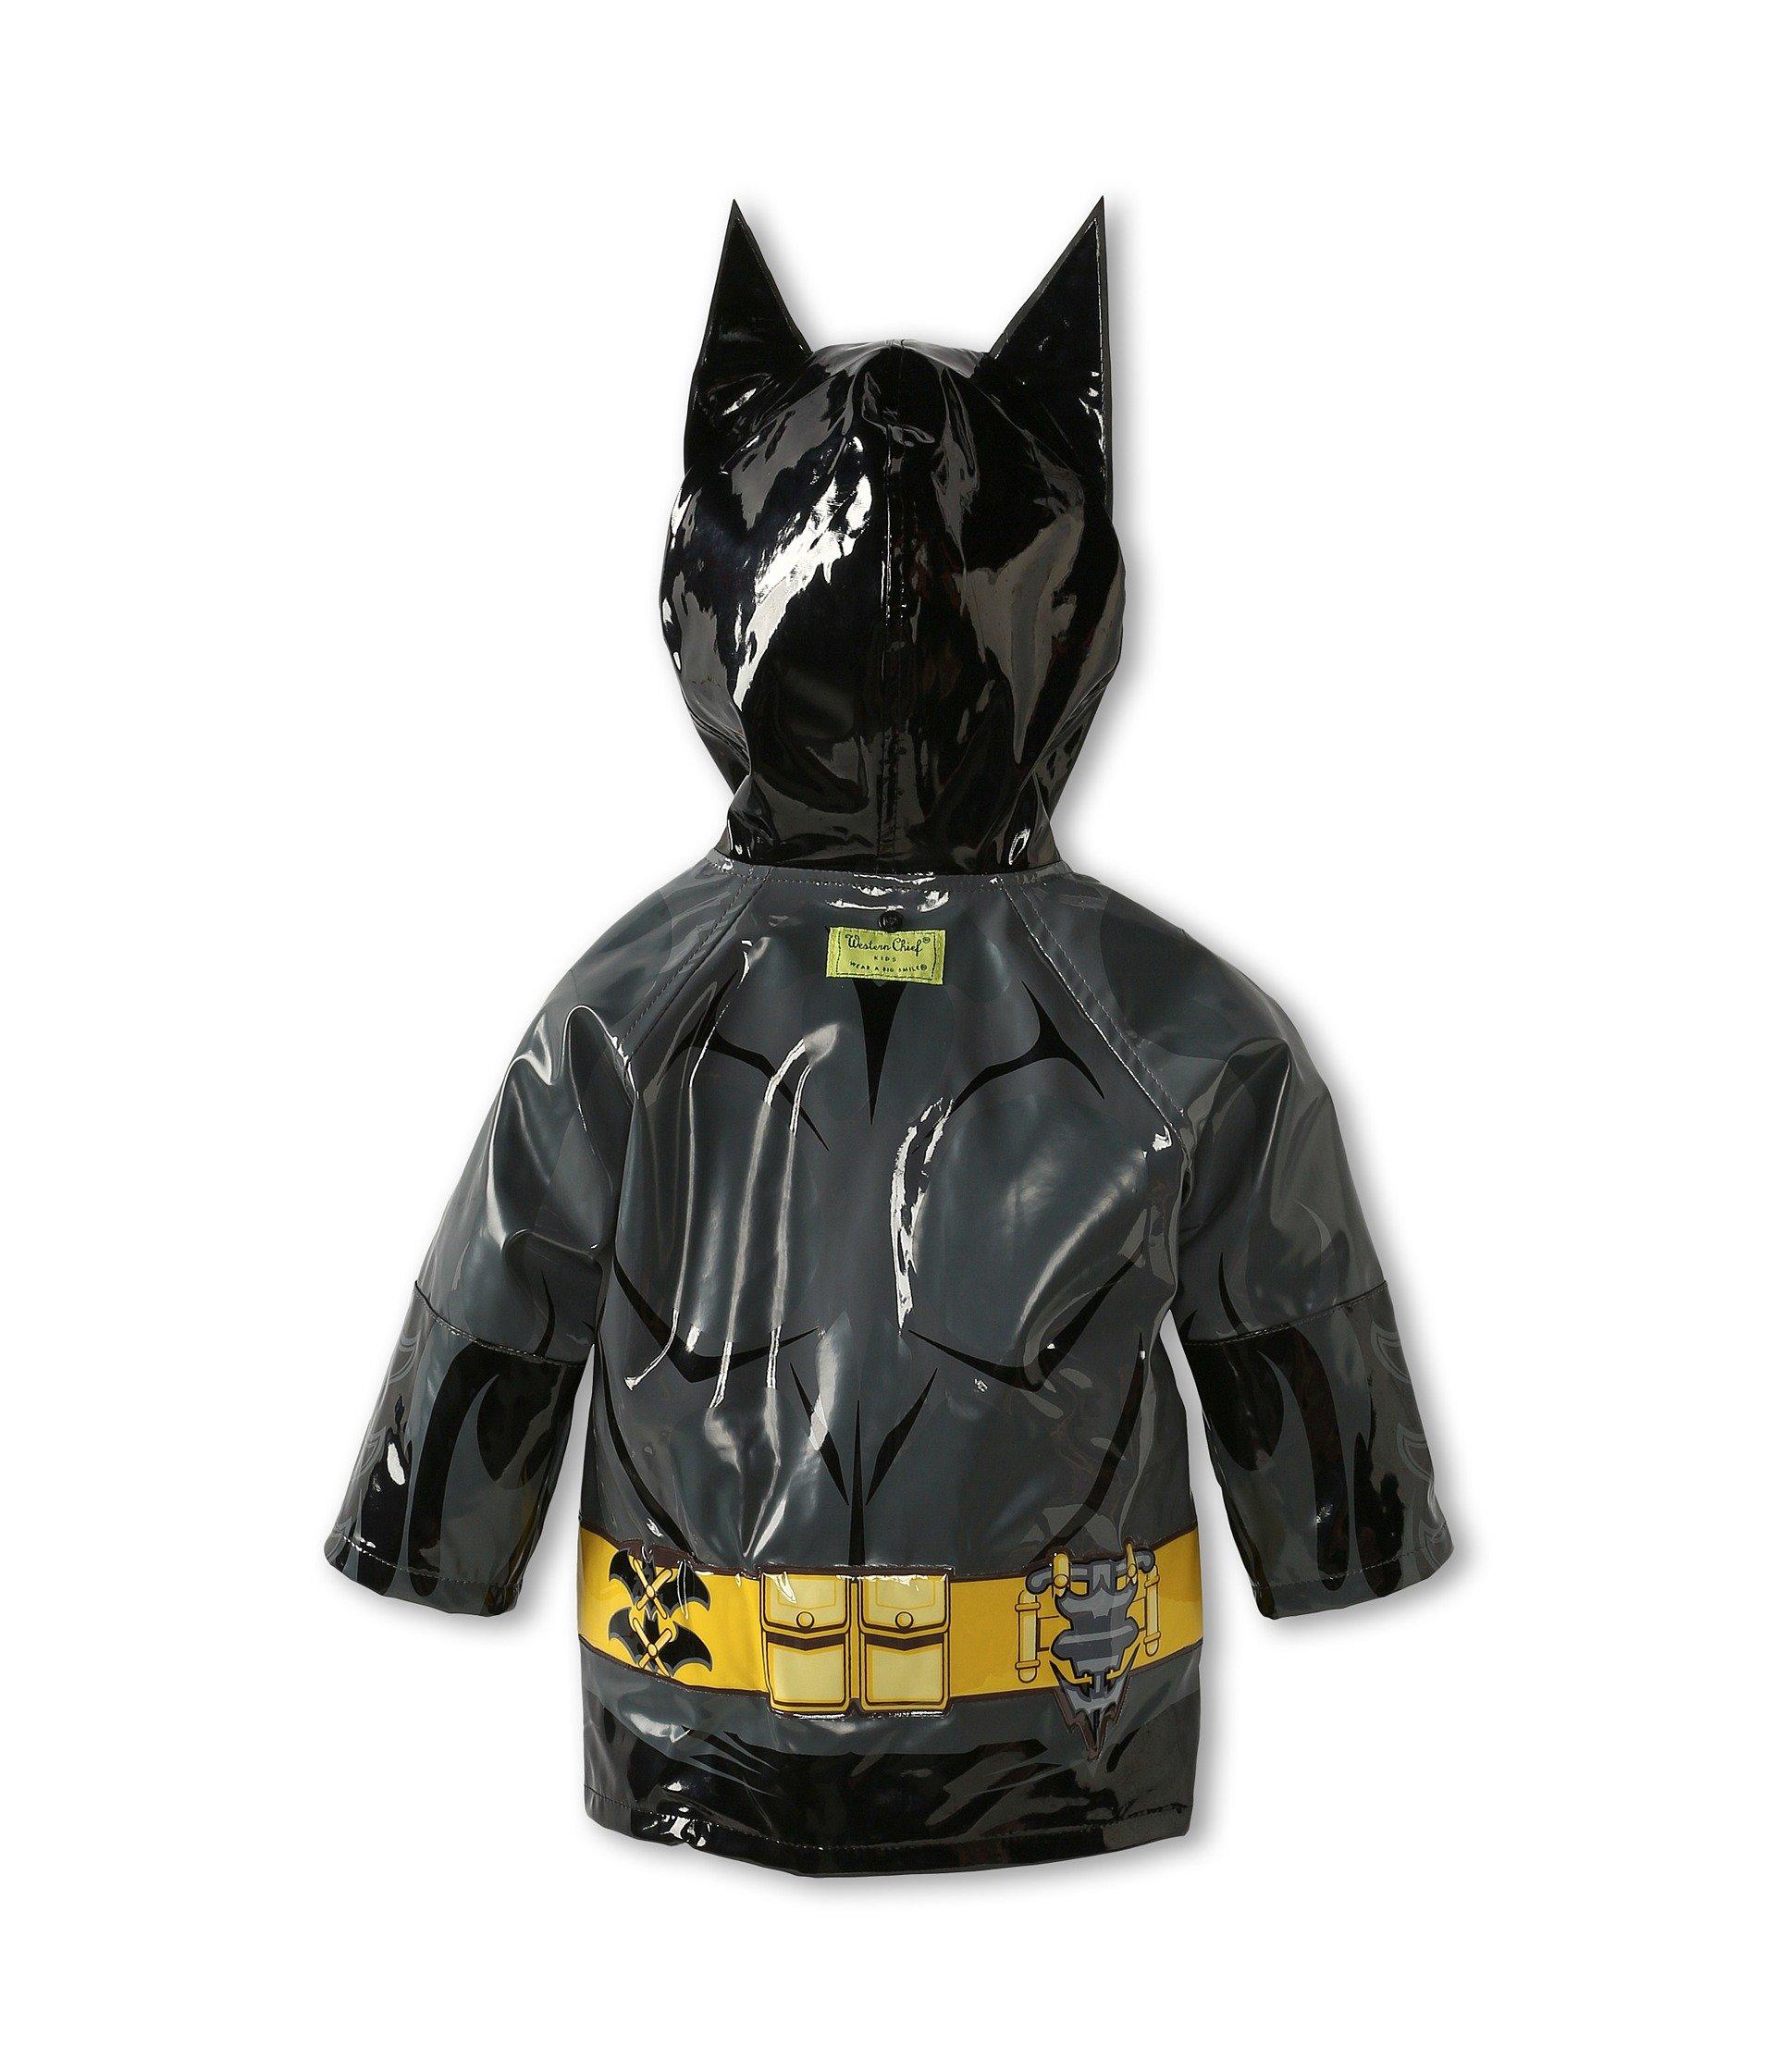 Western Chief Little Boys' Batman Everlasting Rain Coat, Black, 5/6 by Western Chief (Image #5)